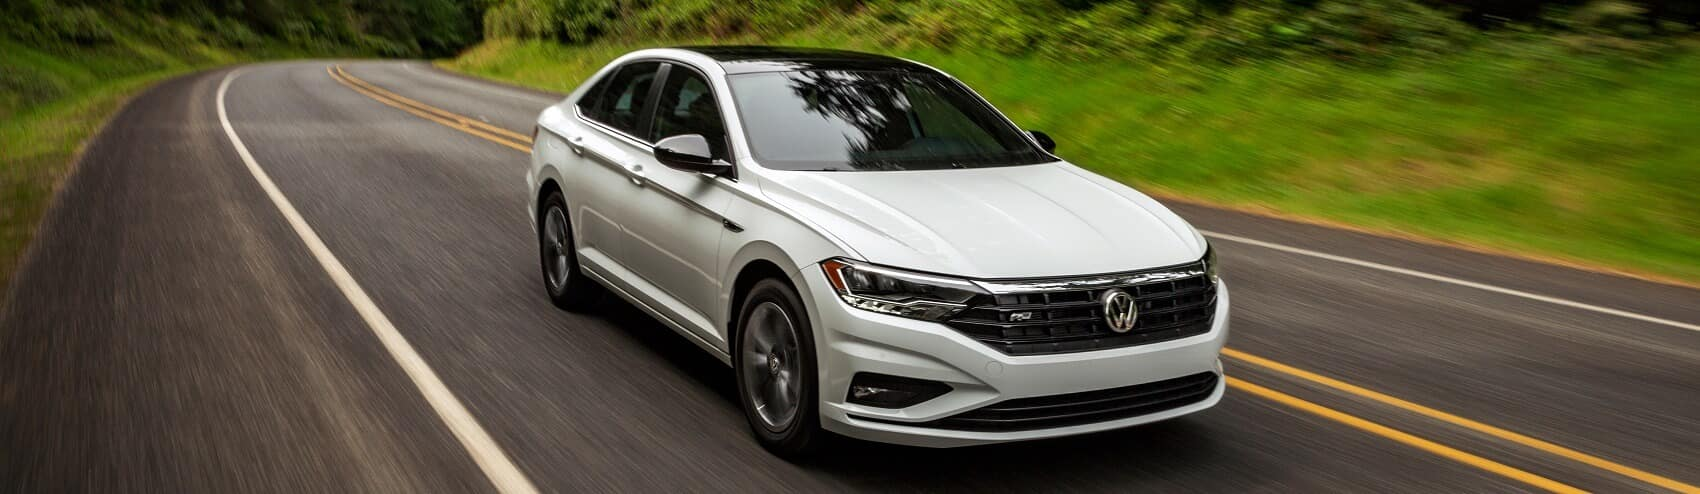 Volkswagen Jetta Technology Package